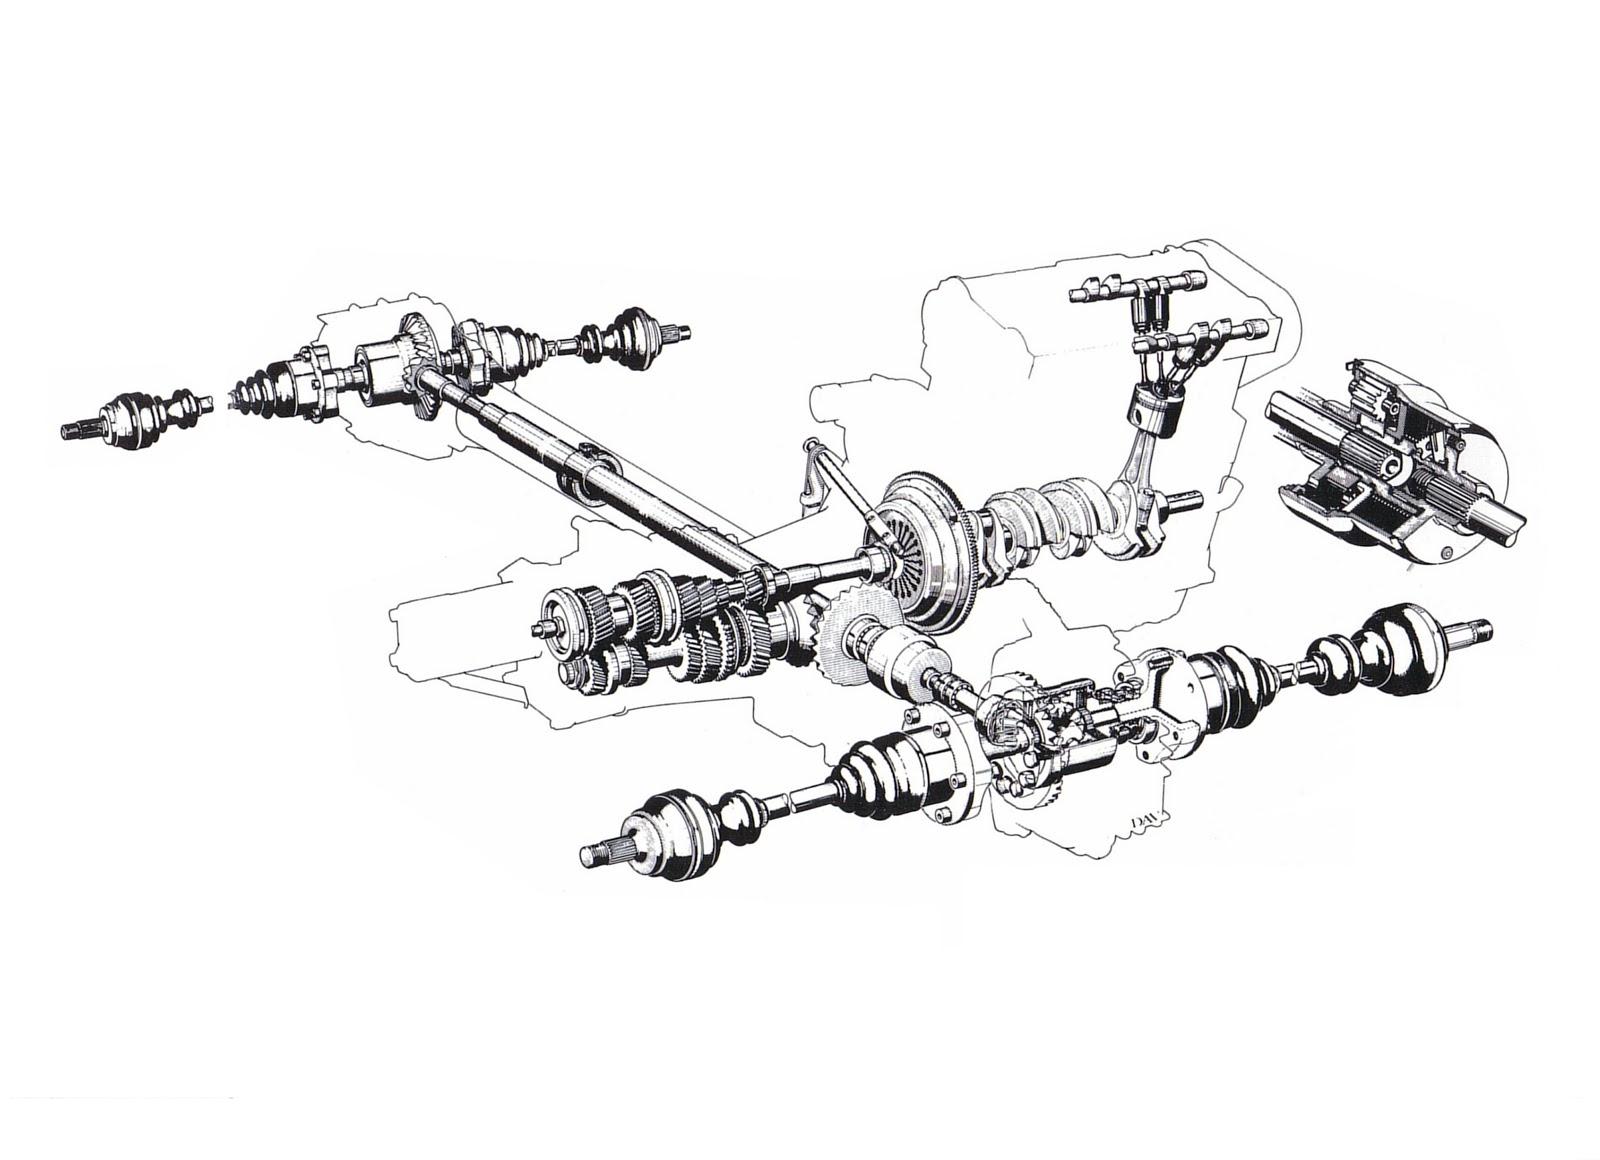 Vr6 Turbo Ford Fiesta Engine Swap